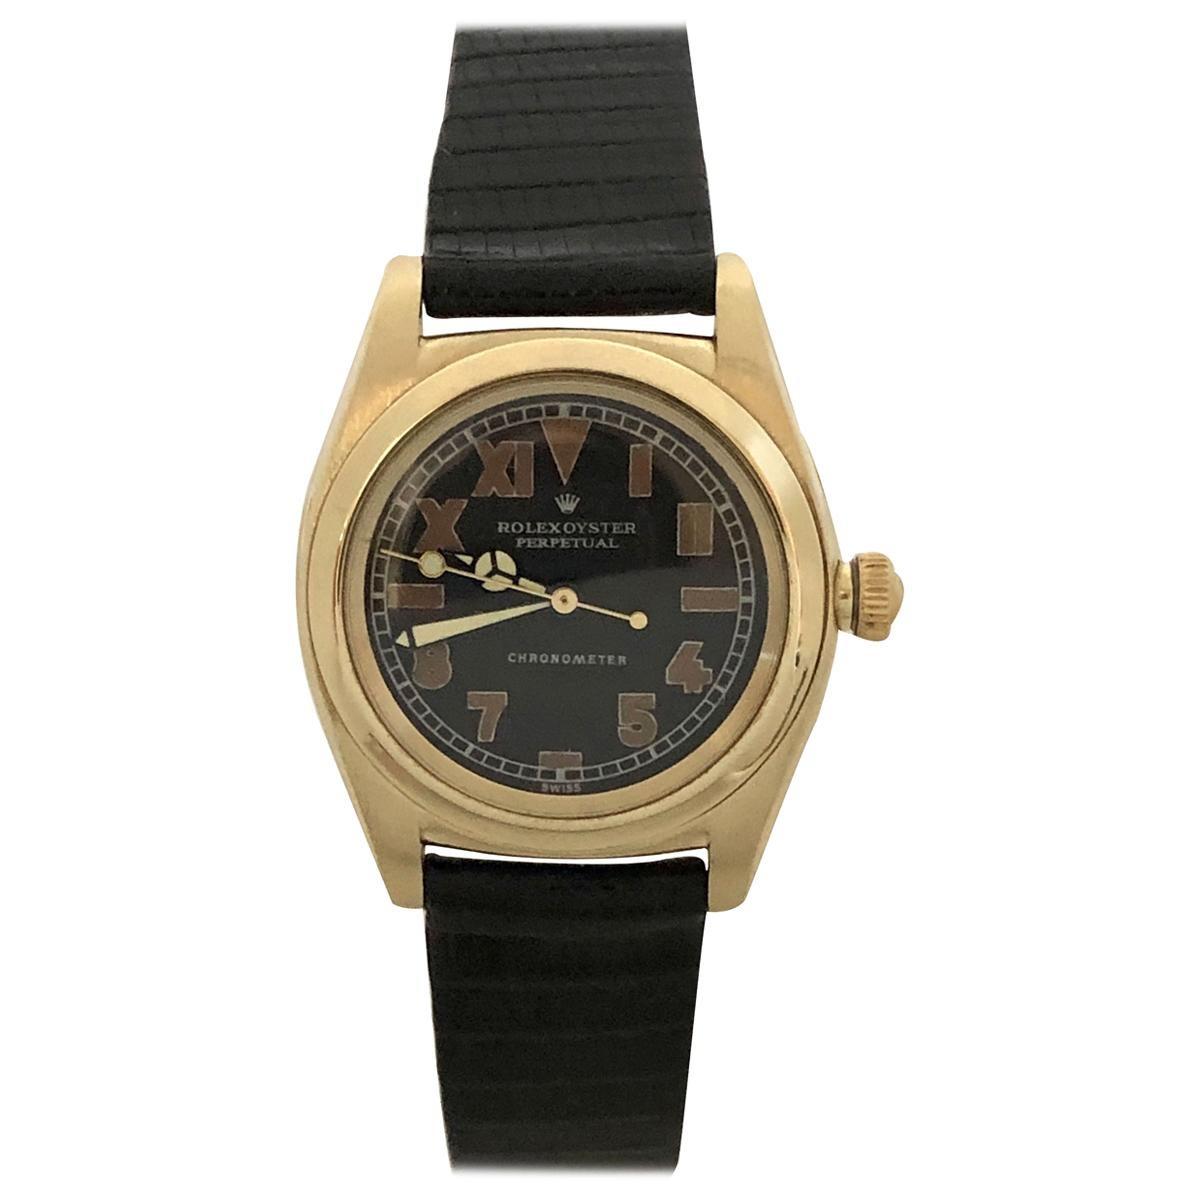 Rolex 1940s Yellow Gold Automatic Bubble Back Wristwatch